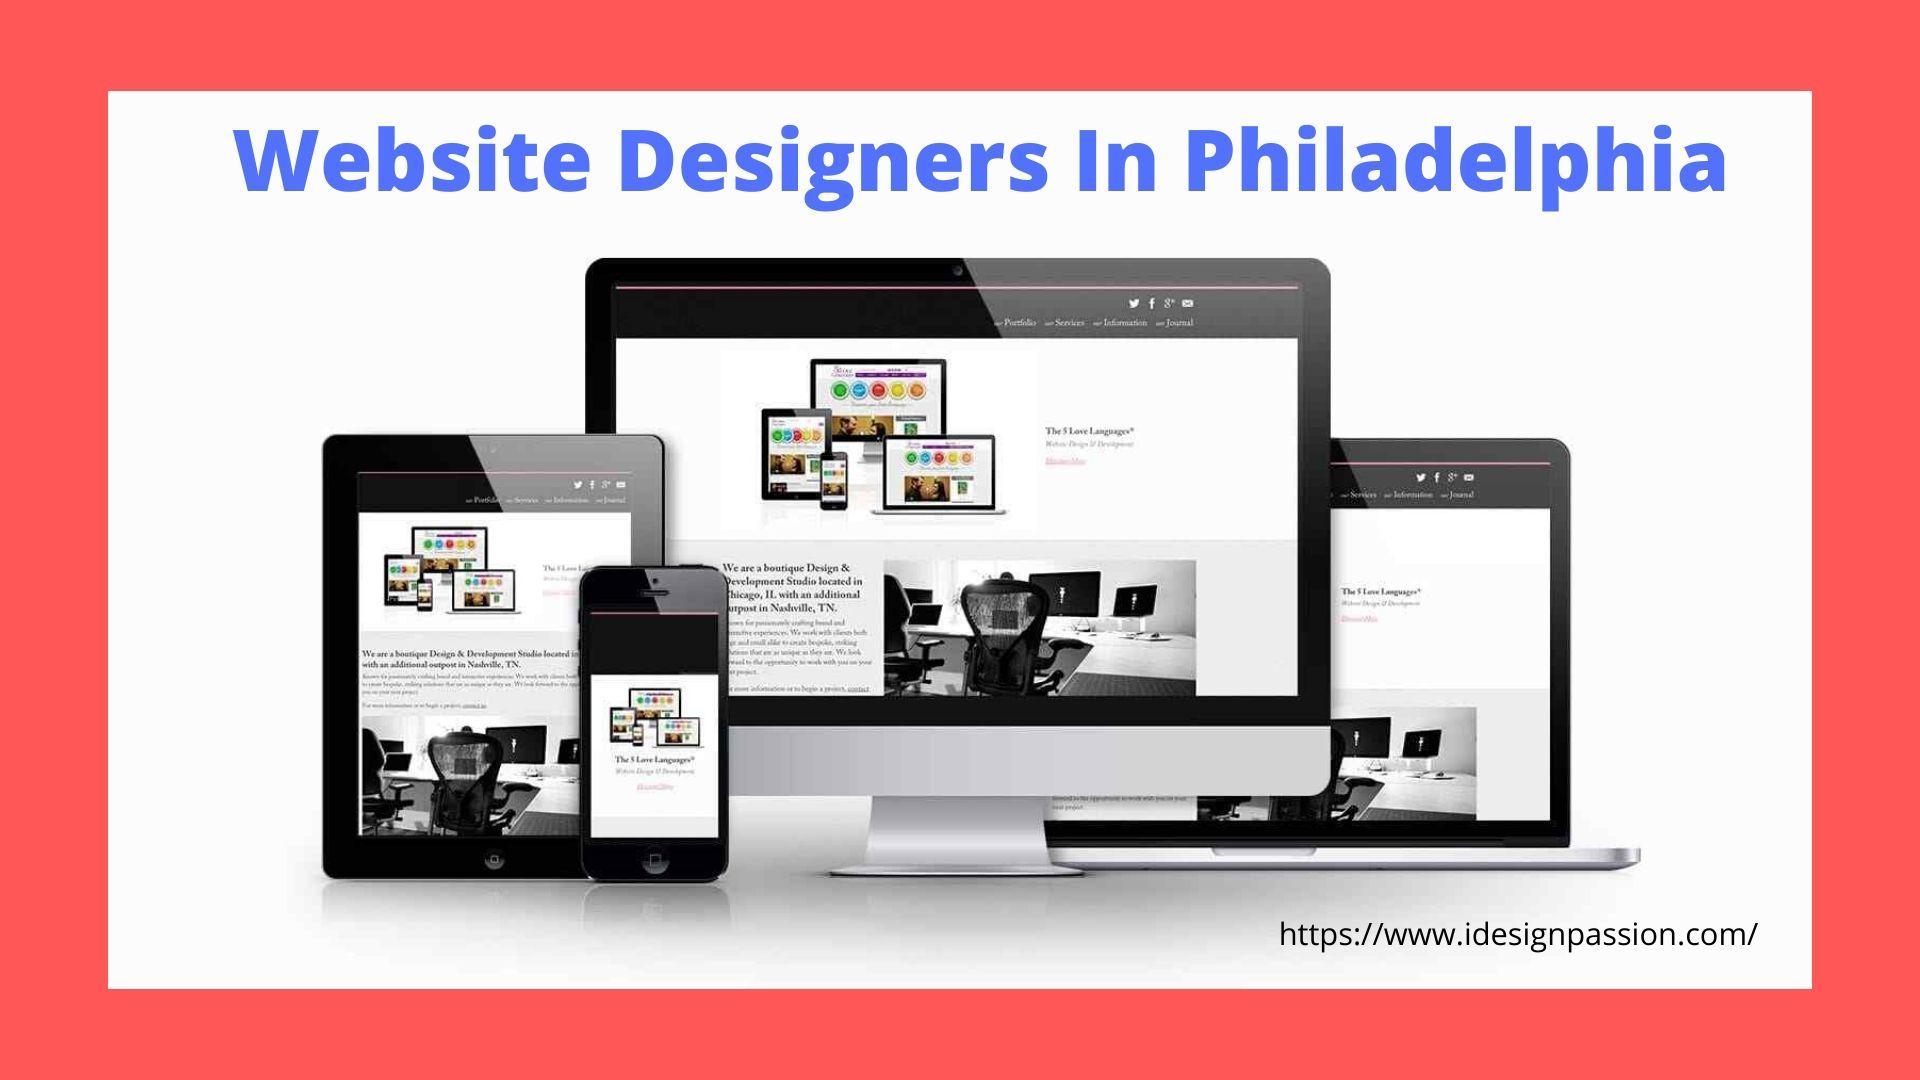 Leading Website Design Company In Philadelphia Website Design Company Web Design Firm Website Design